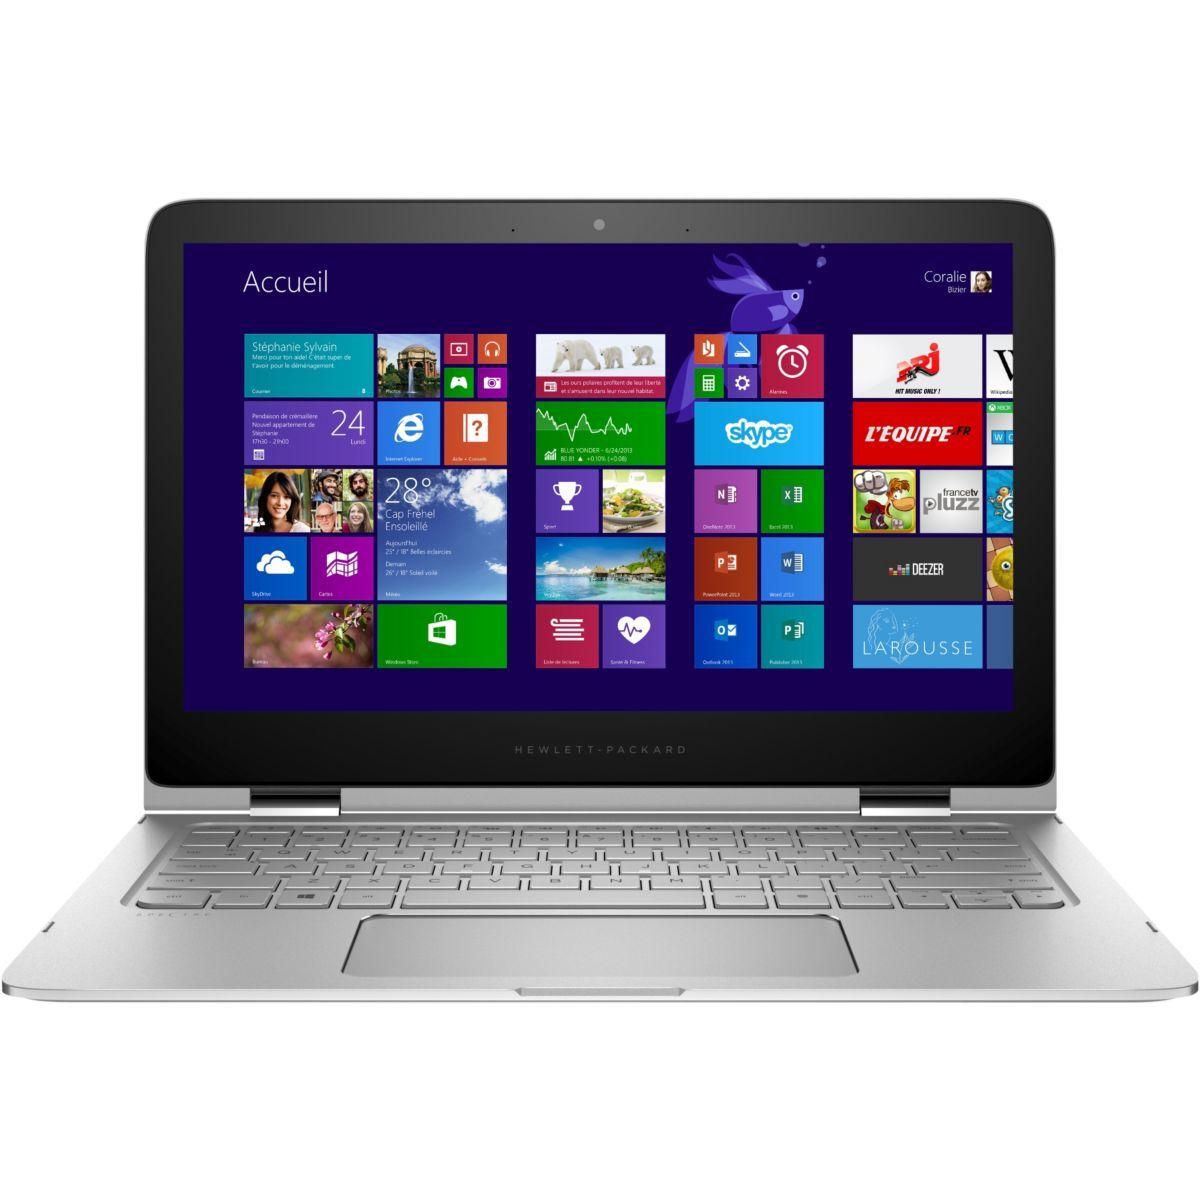 Pc Hybride 13 4000nf X360 Hp Pas Cher Webdistrib Laptop Prix Promo 97319